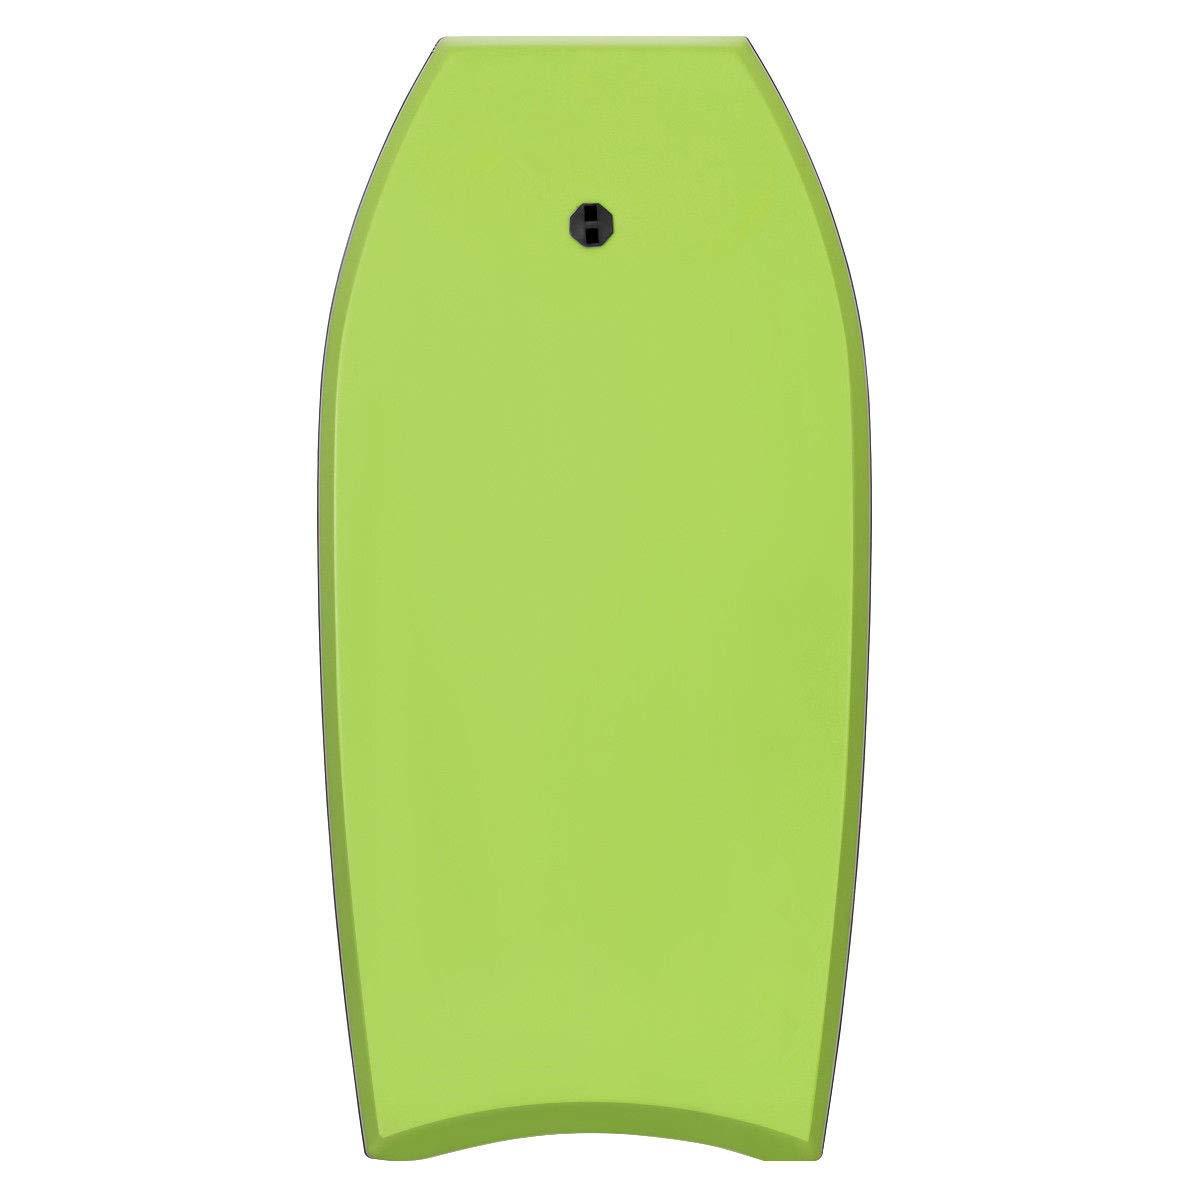 oldzon Bodyboard Surfing 41'' Lightweight Super W/Leash IXPE Deck EPS Core Boarding with Ebook